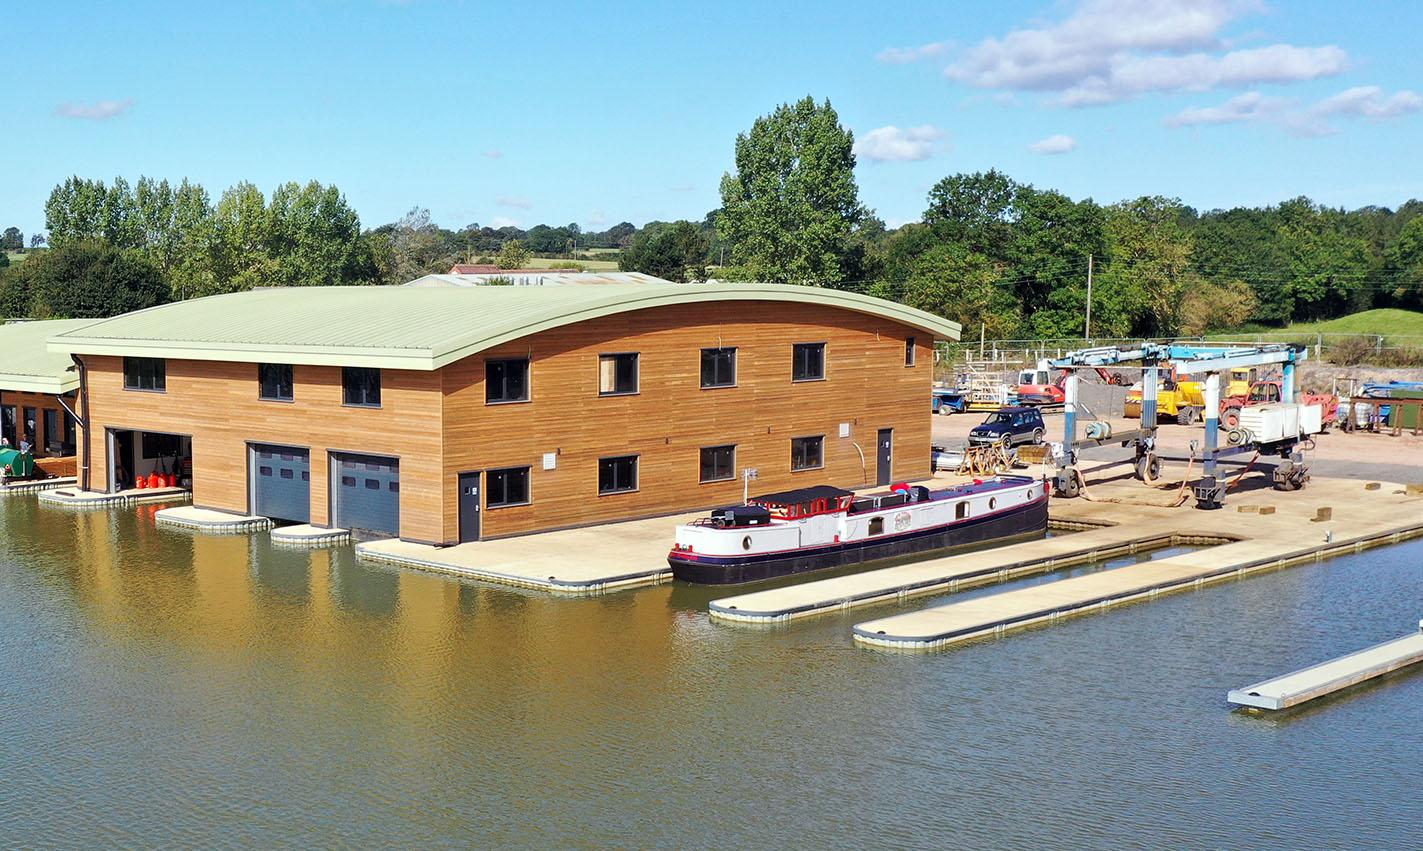 Launching Docks